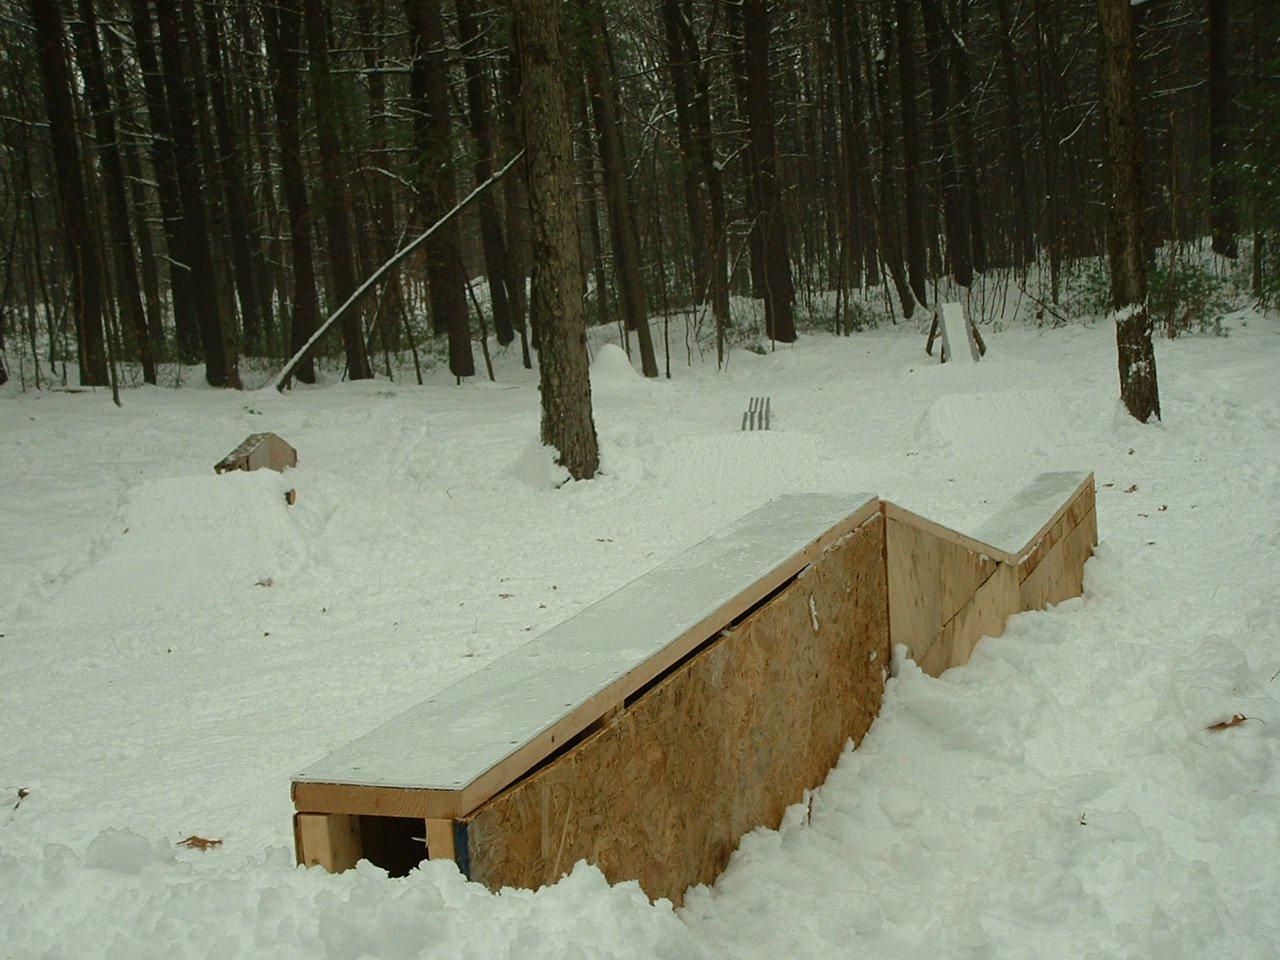 Lower backyard park